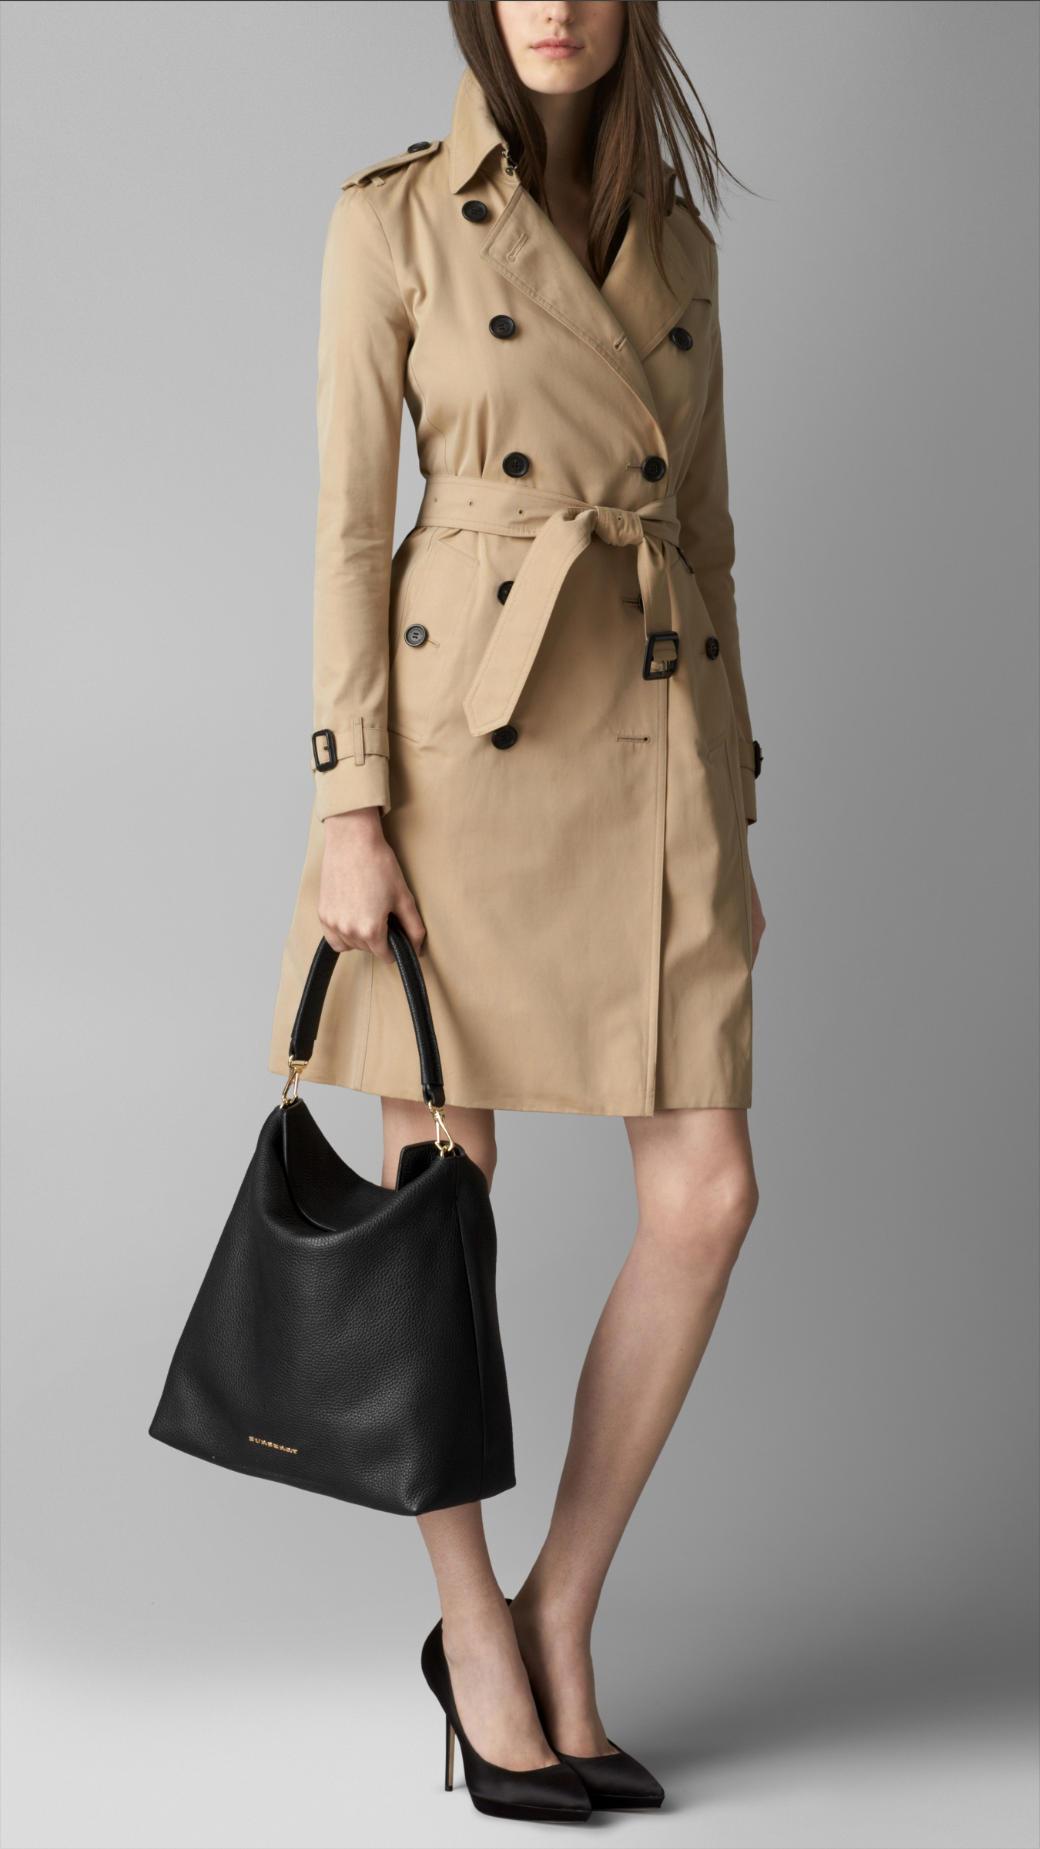 c7613fb2065c Lyst - Burberry Medium Leather Hobo Bag in Black